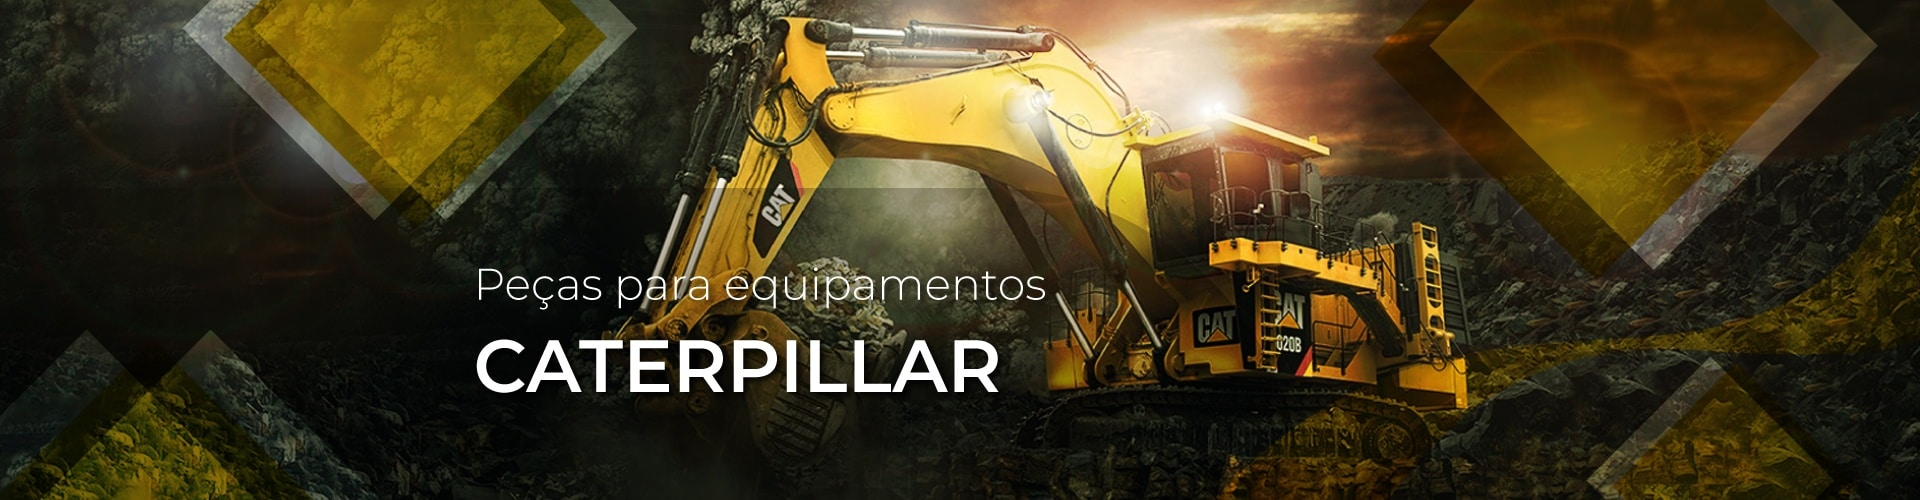 Banner_Site_4_Abril_v1_Peças_Caterpillar